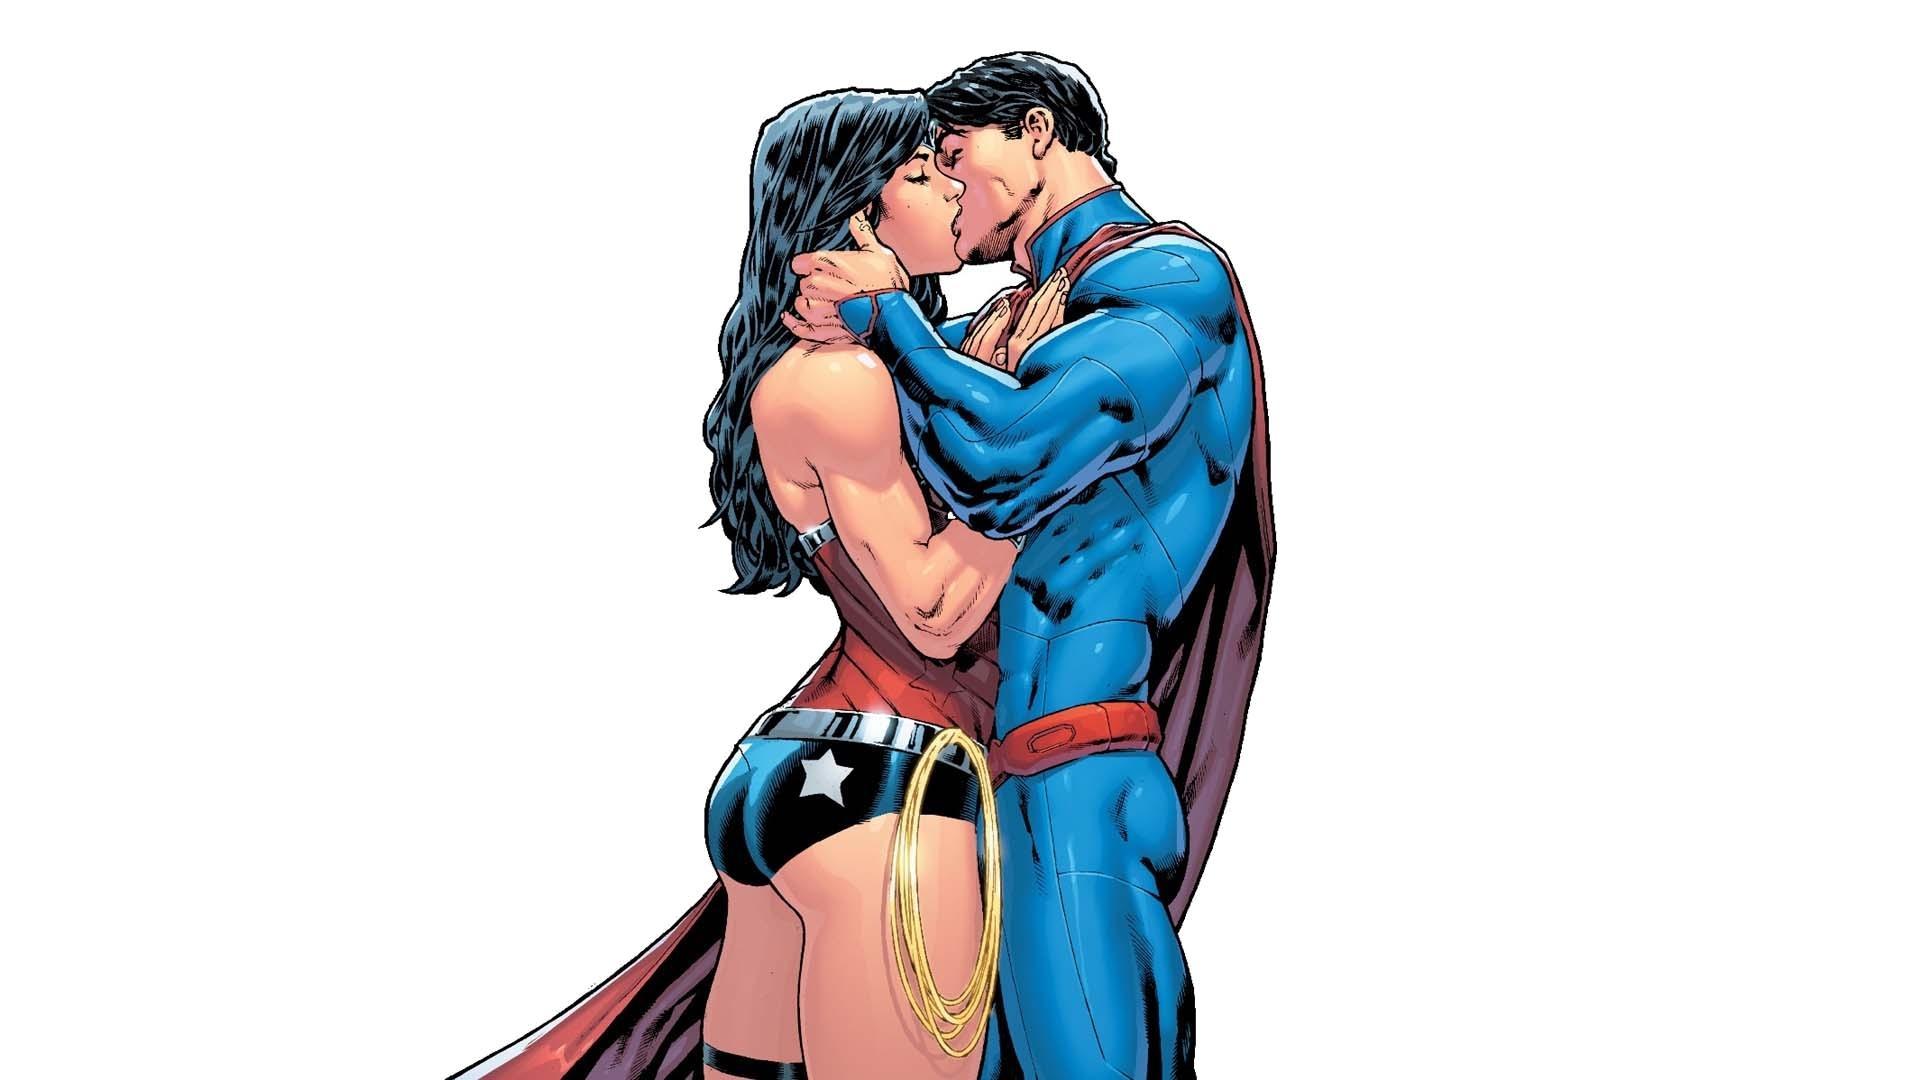 Superman Wonder Woman wallpapers HD quality